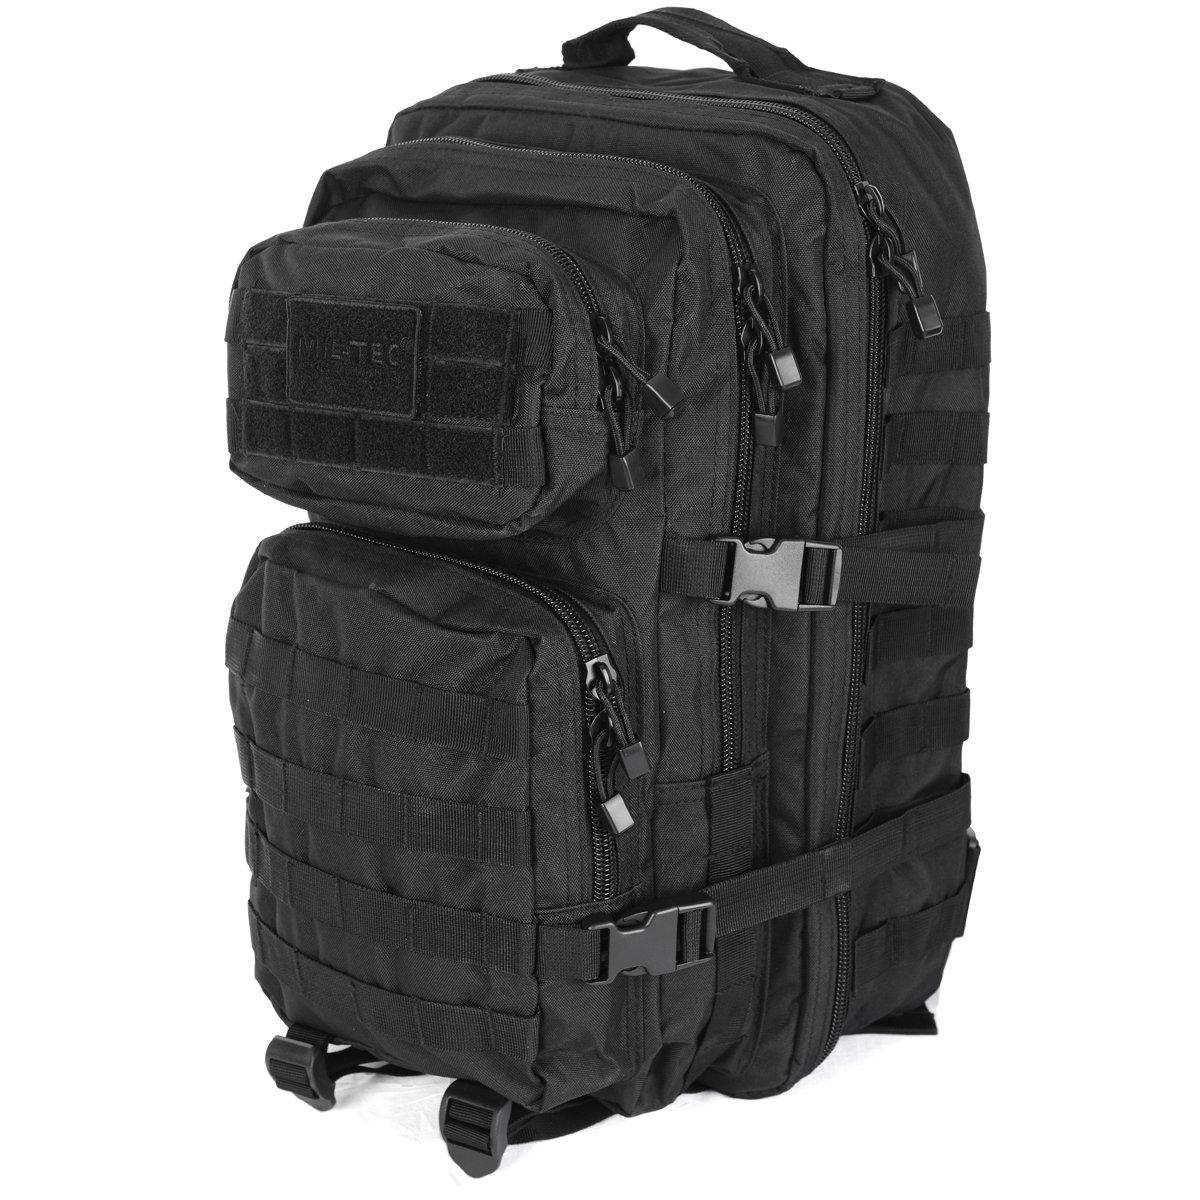 2e0d755dca Mil-Tec MOLLE Tactical Assault Backpack - Large 36 Litre (Black)